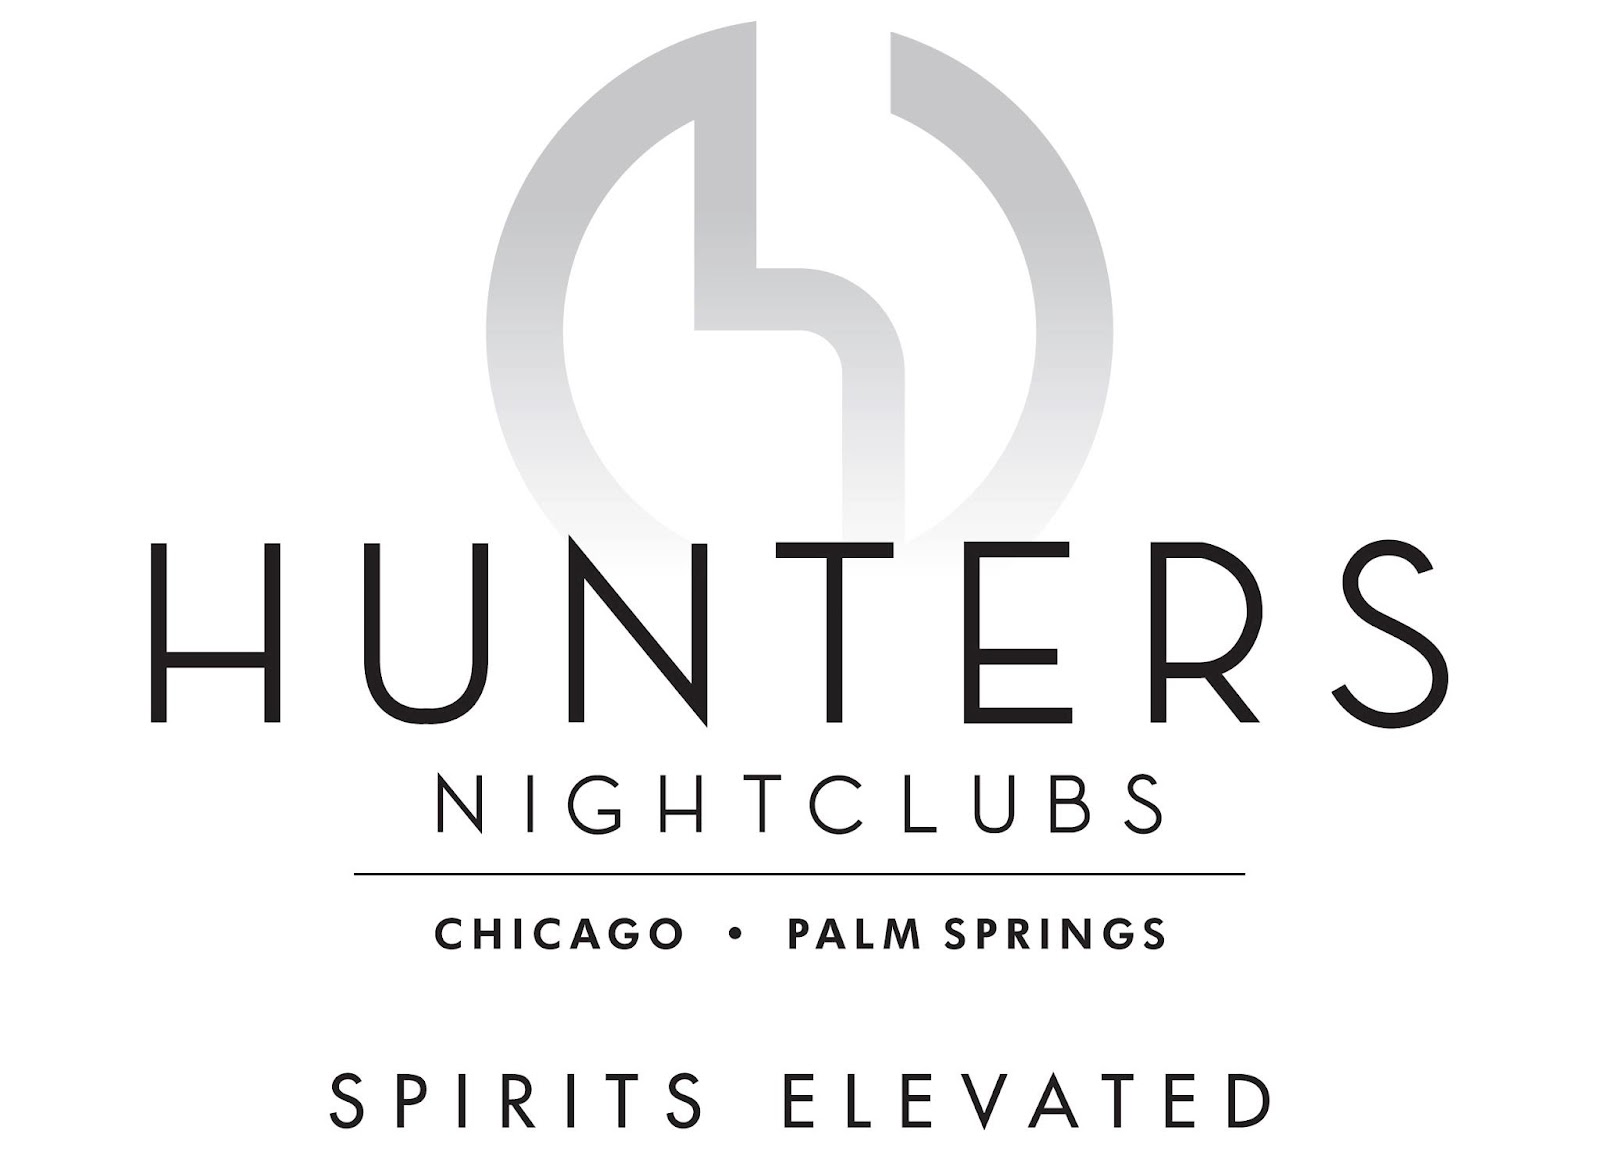 Hunters Night Clubs